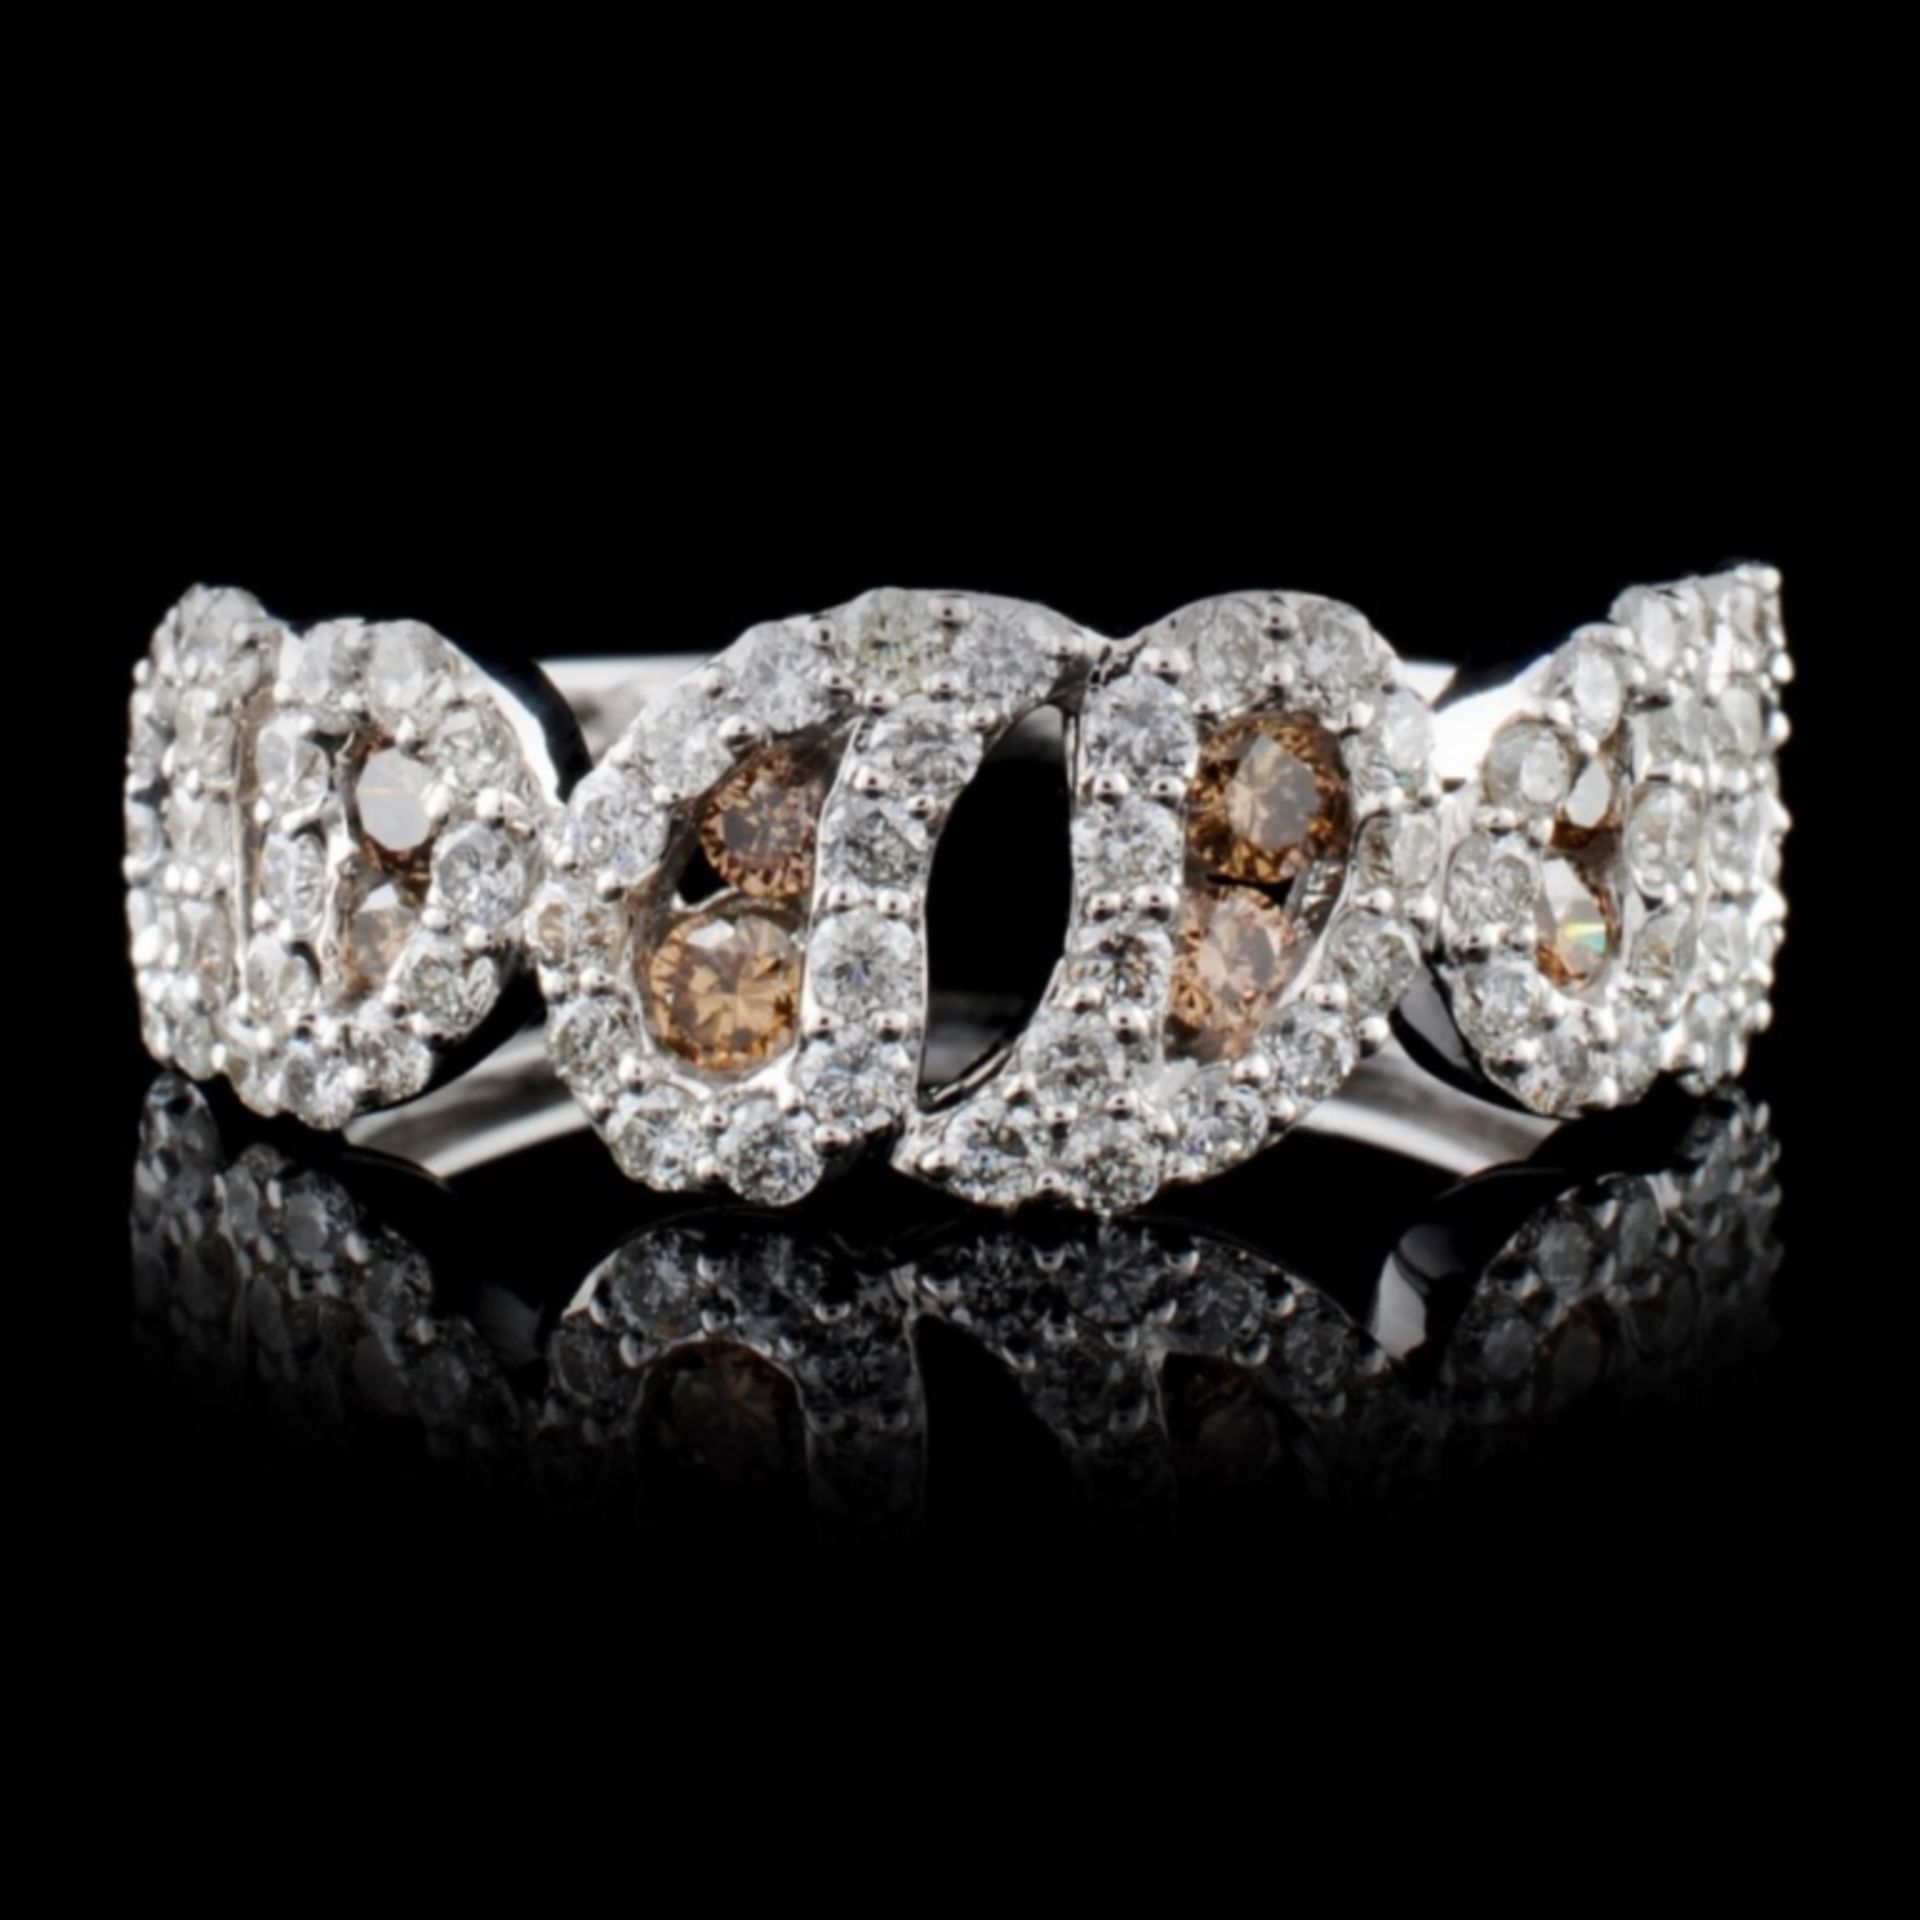 14K White Gold 1.06ctw Fancy Color Diamond Ring